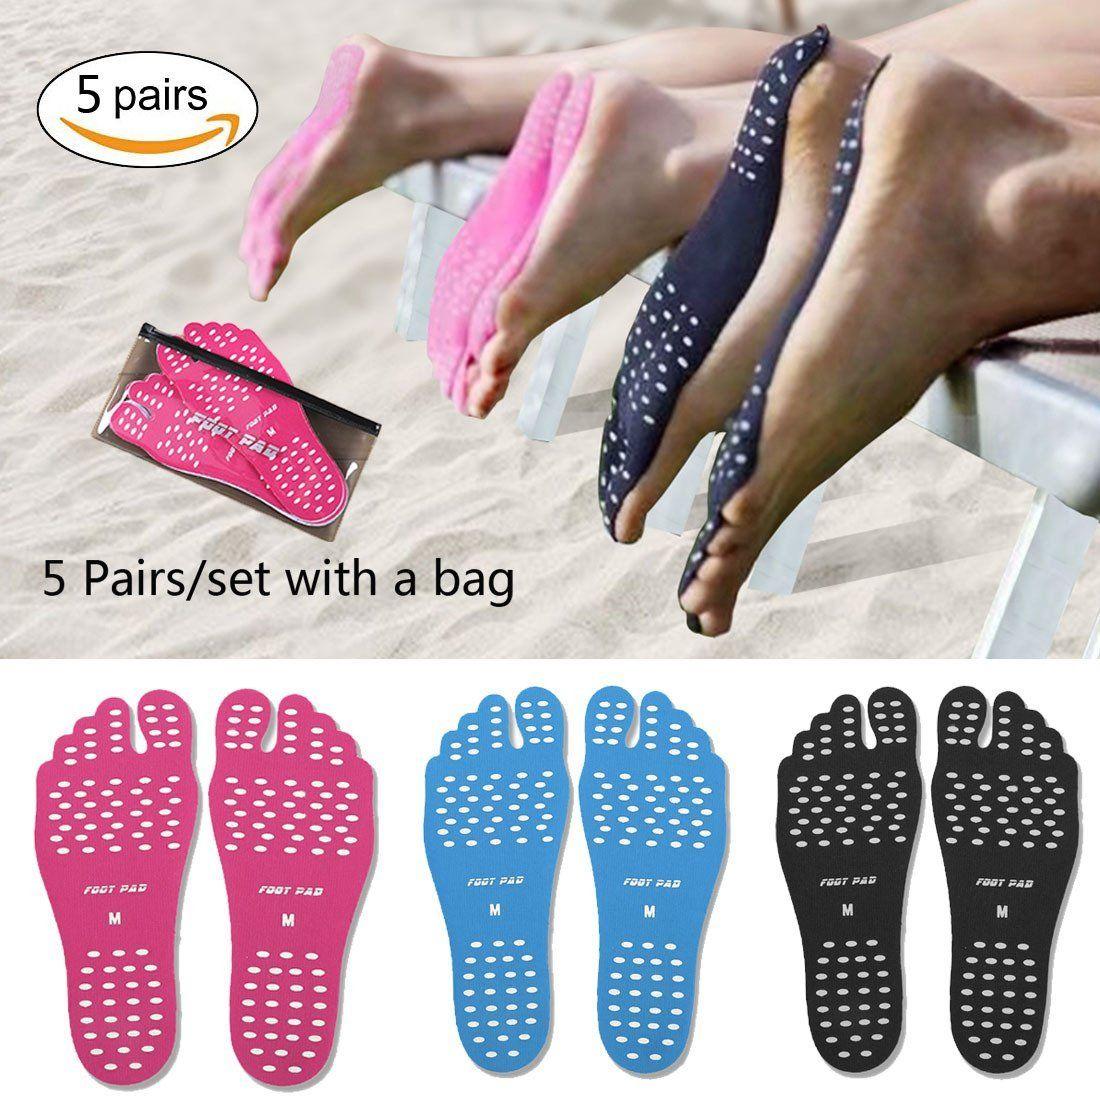 Anti-Slip and Waterproof Unisex Beach Foot Pads Barefoot Foot Stickers